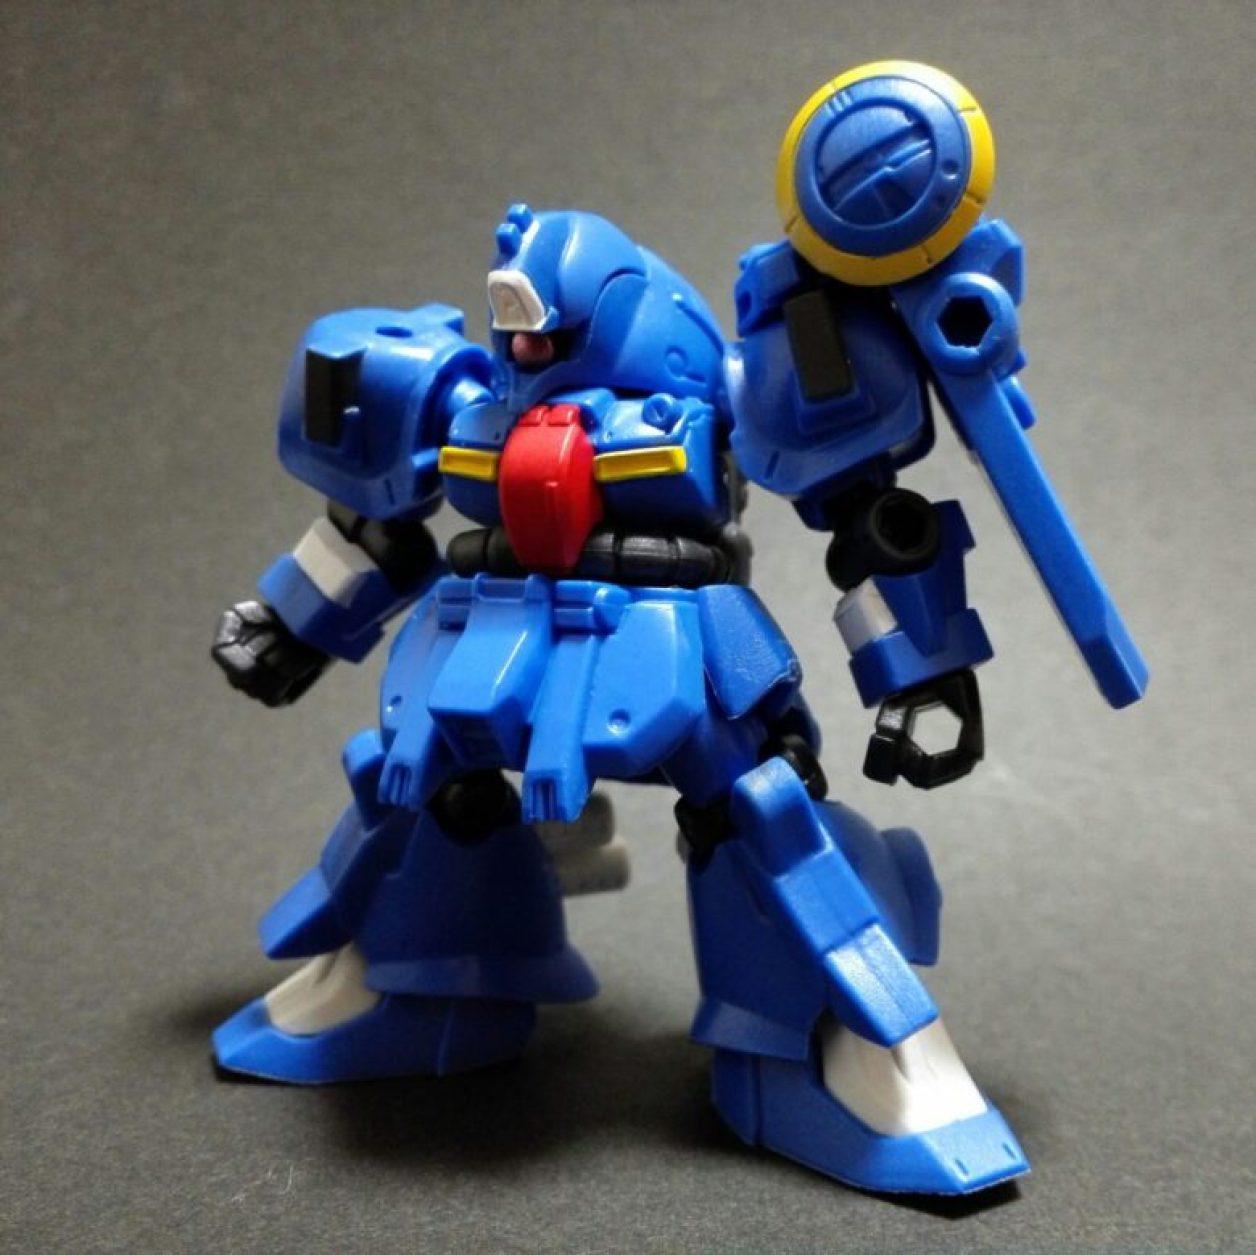 mobile suit ensemble 13弾のゼクアインとms武器セットの組み合わせより第2種兵装の組立方法を紹介している画像